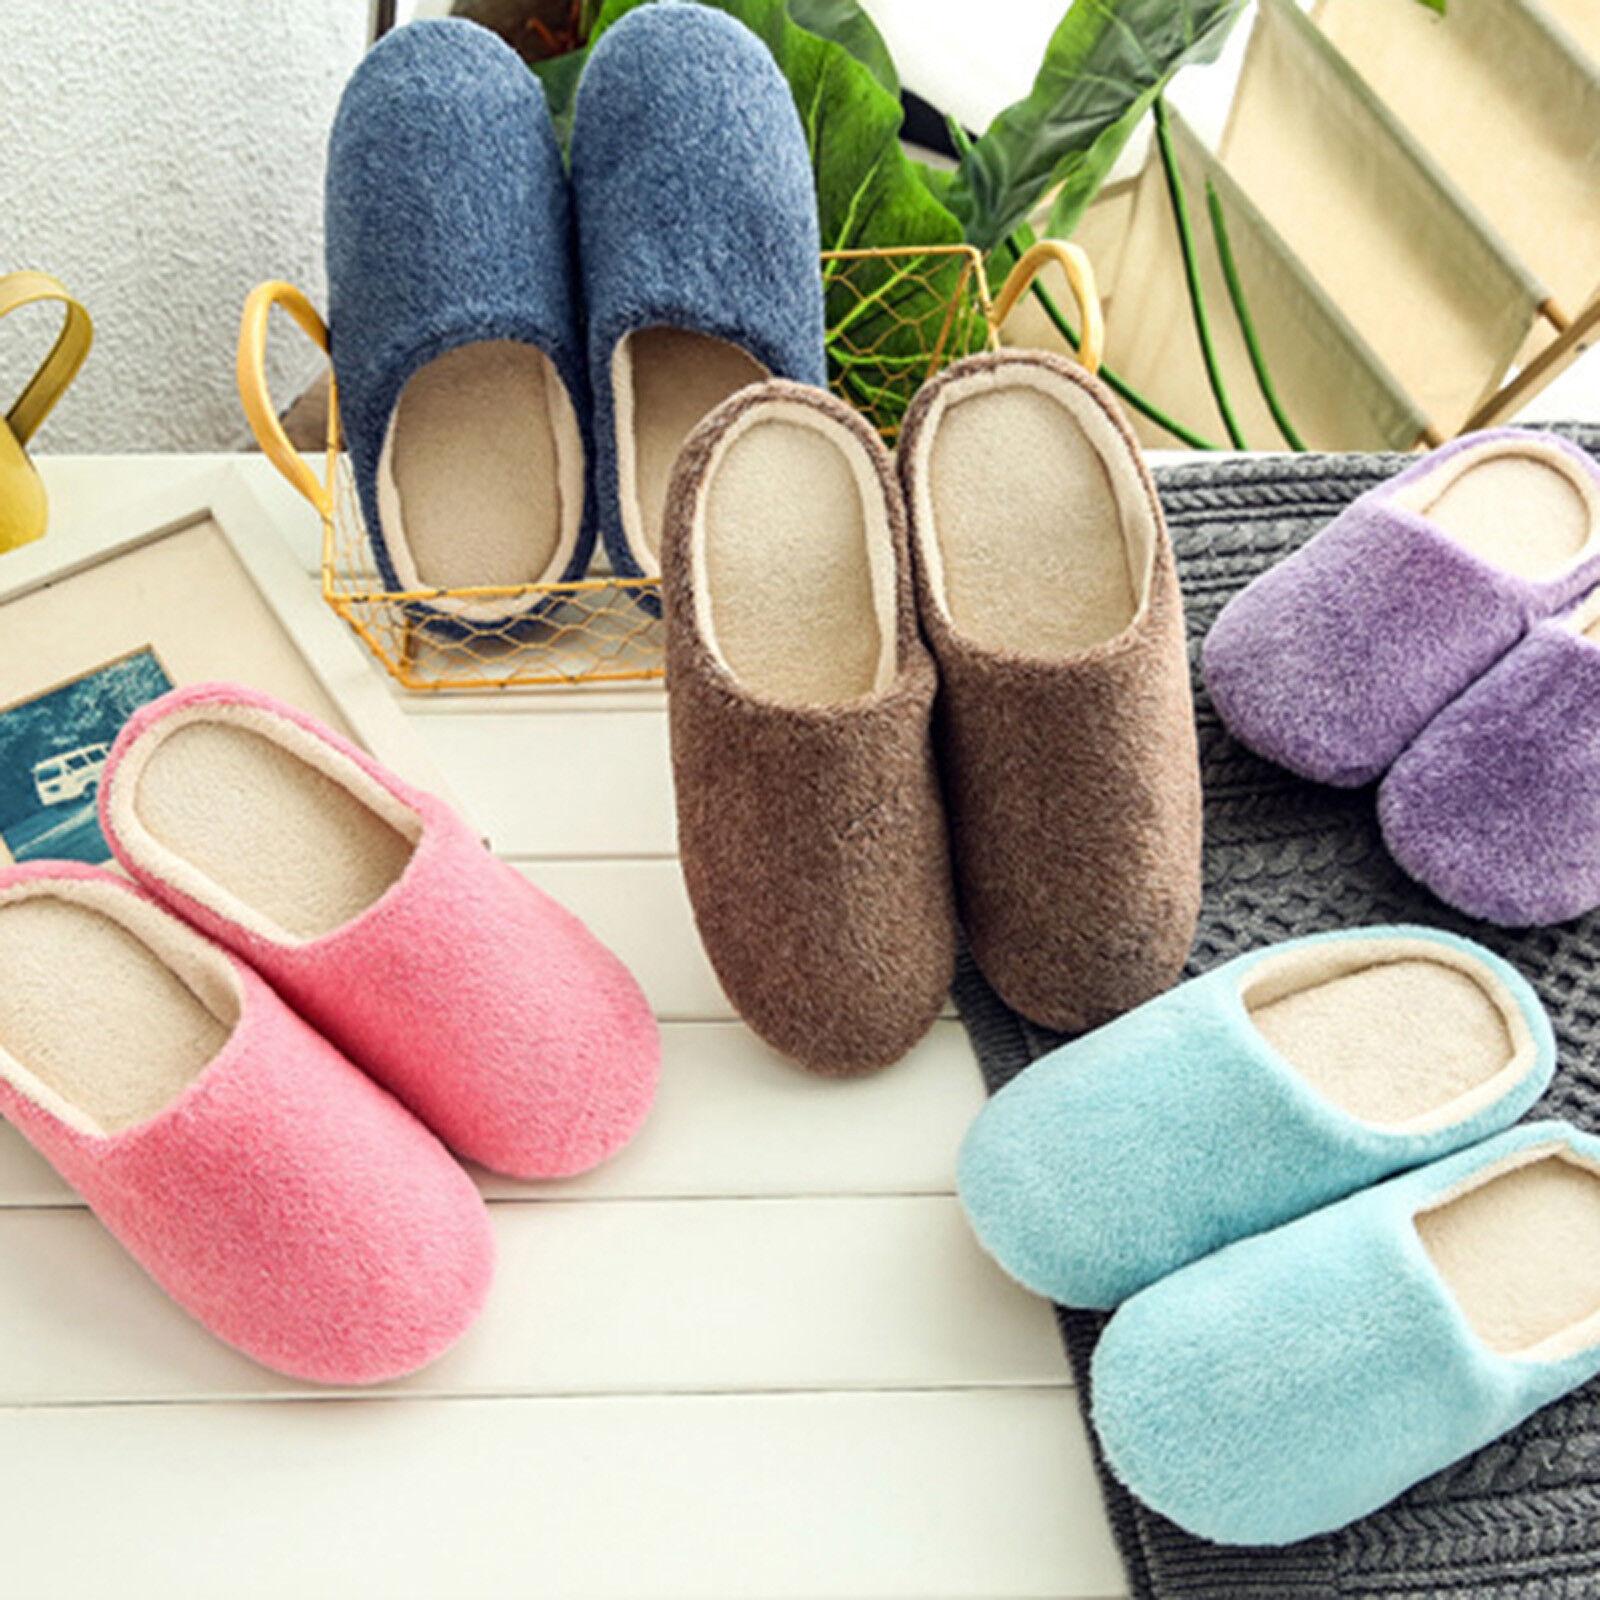 US Womens Men Winter Warm Soft Plush Non Slip Sole Slippers Home Shoes Size OCCA 1